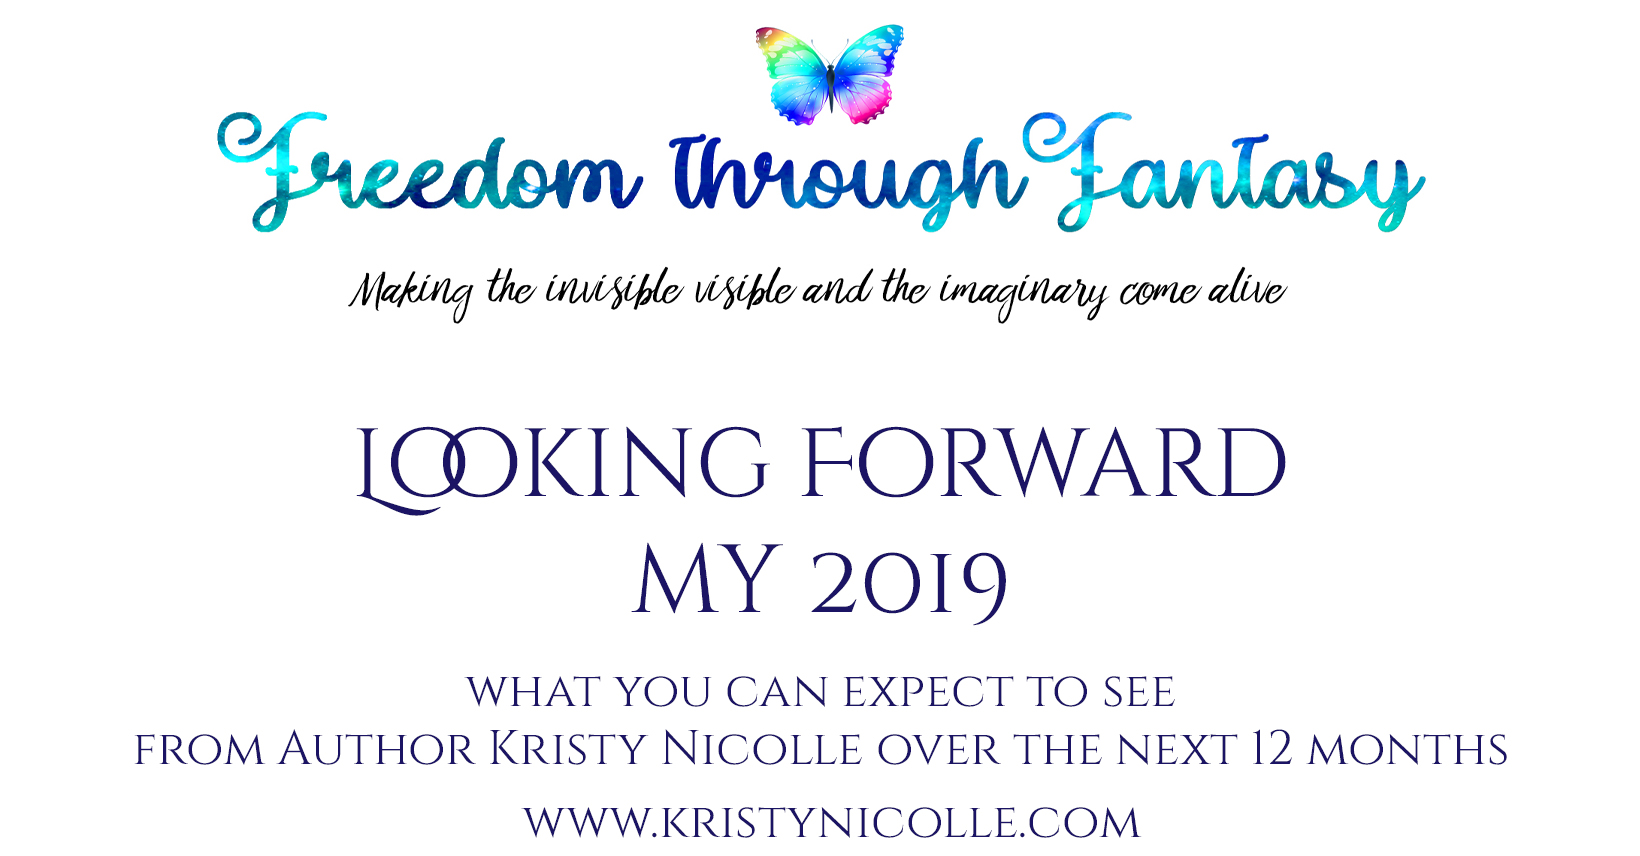 2019 Look Forward- Author Kristy Nicolle